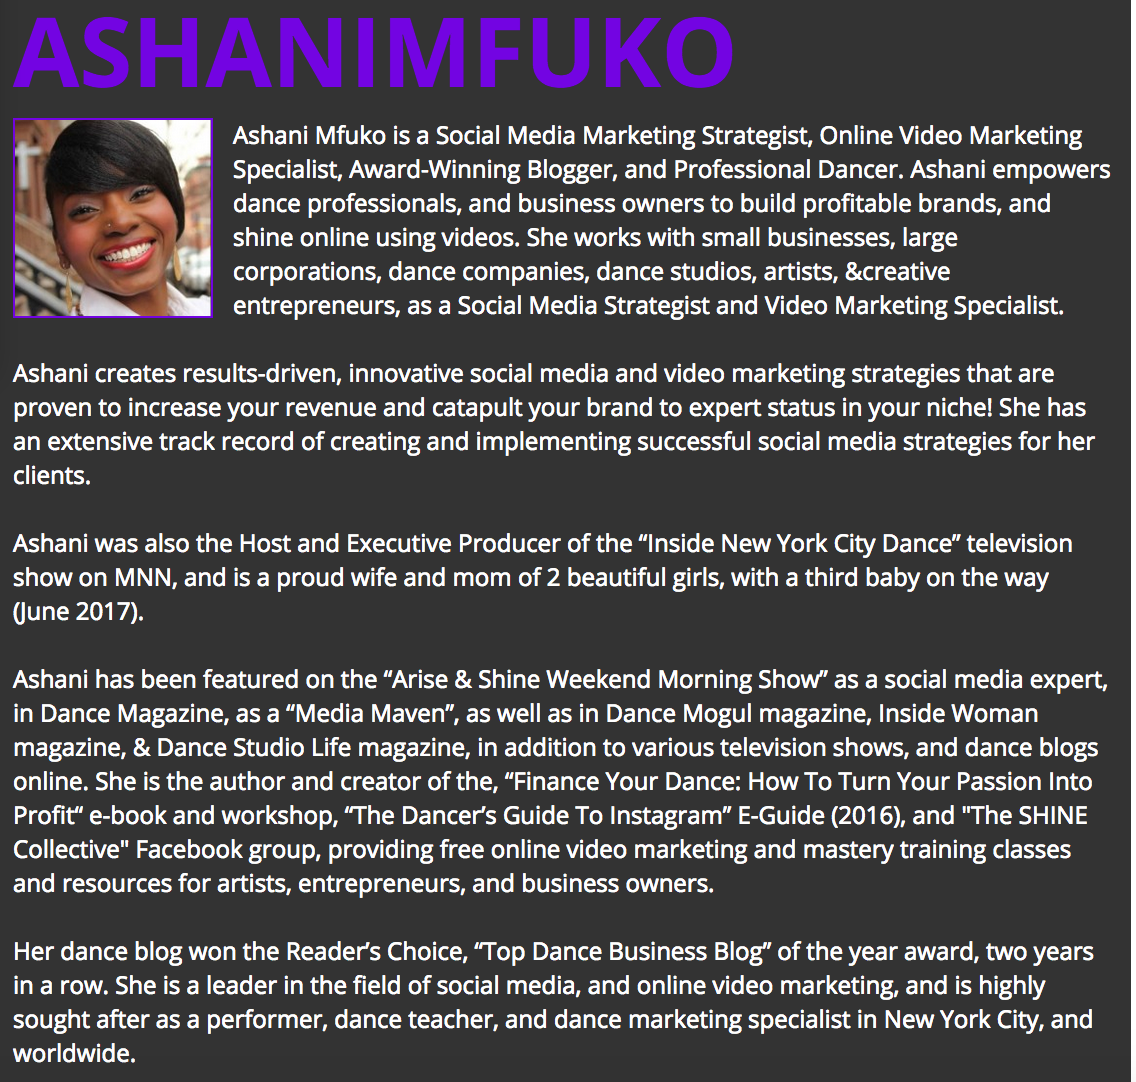 Meet Ashani Mfuko - Social Media Strategist, Video Marketing Specialist